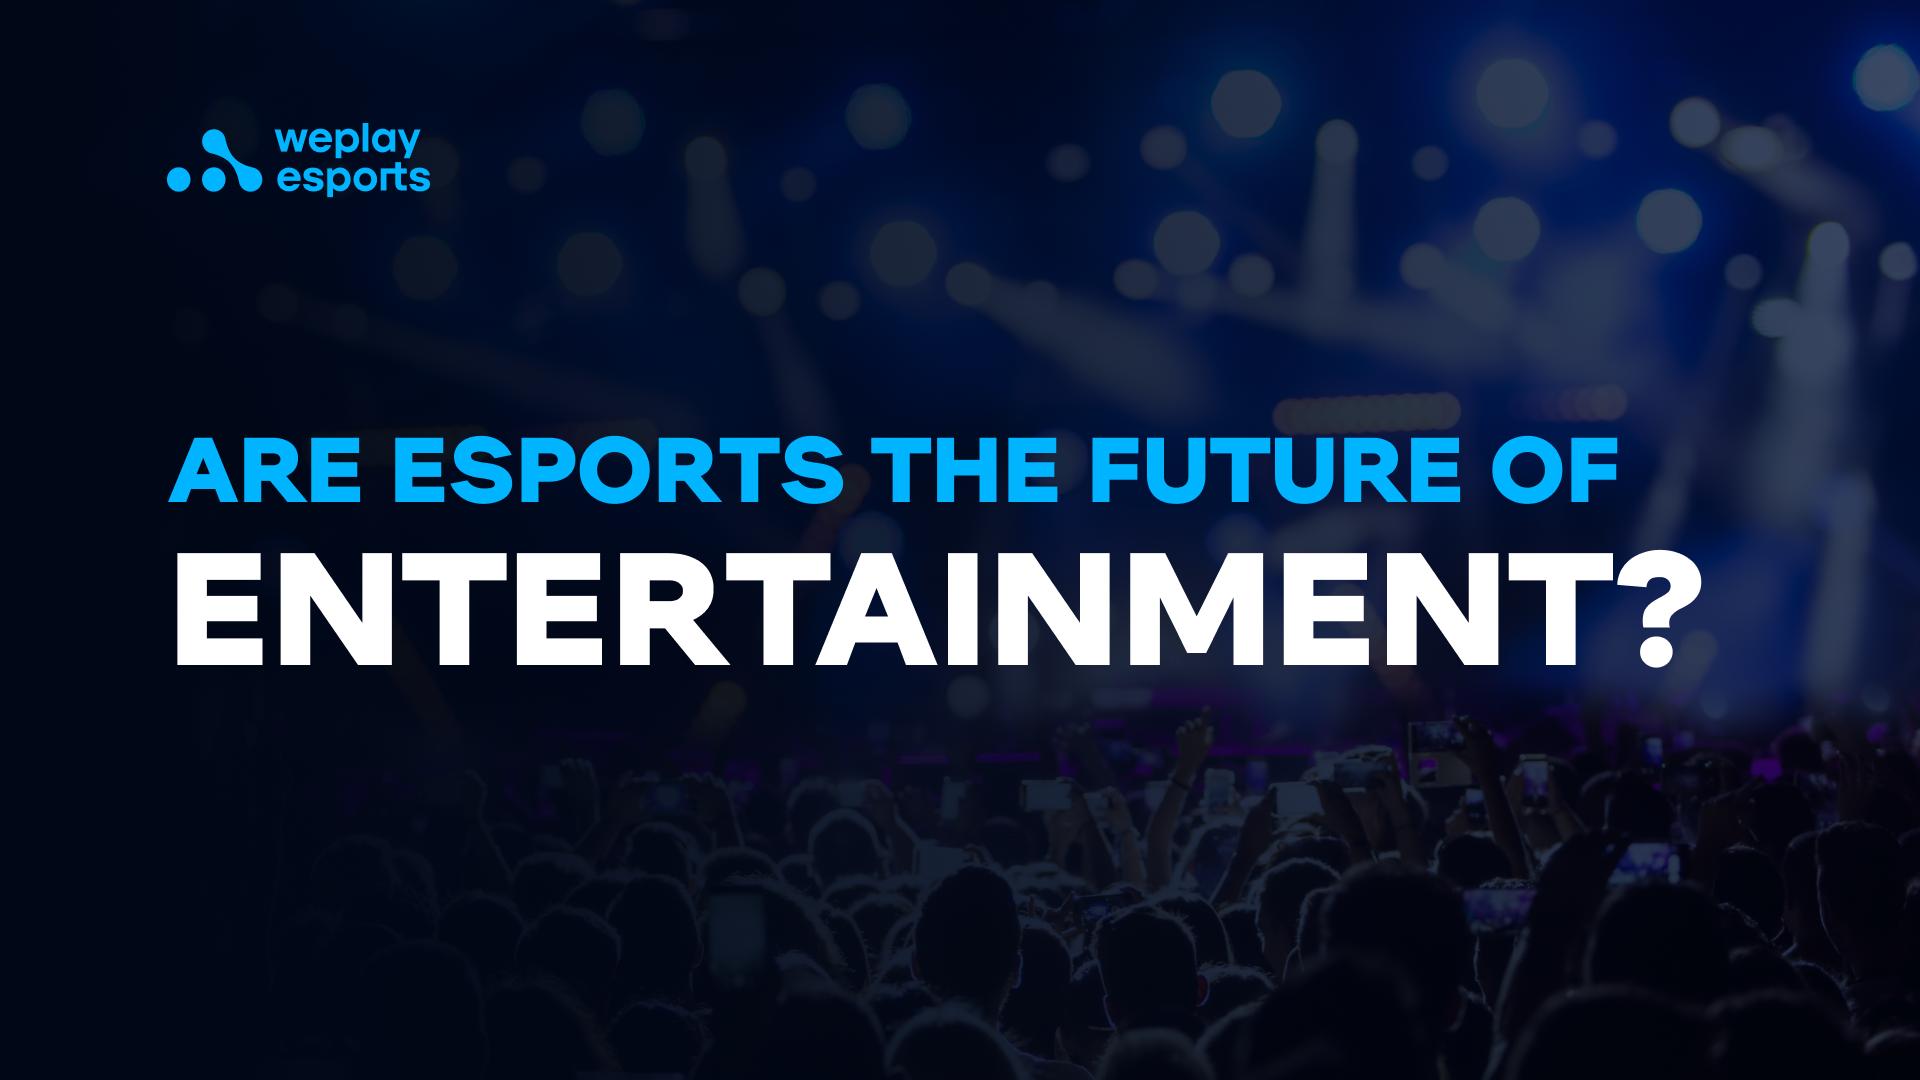 Are esports the future of entertainment?